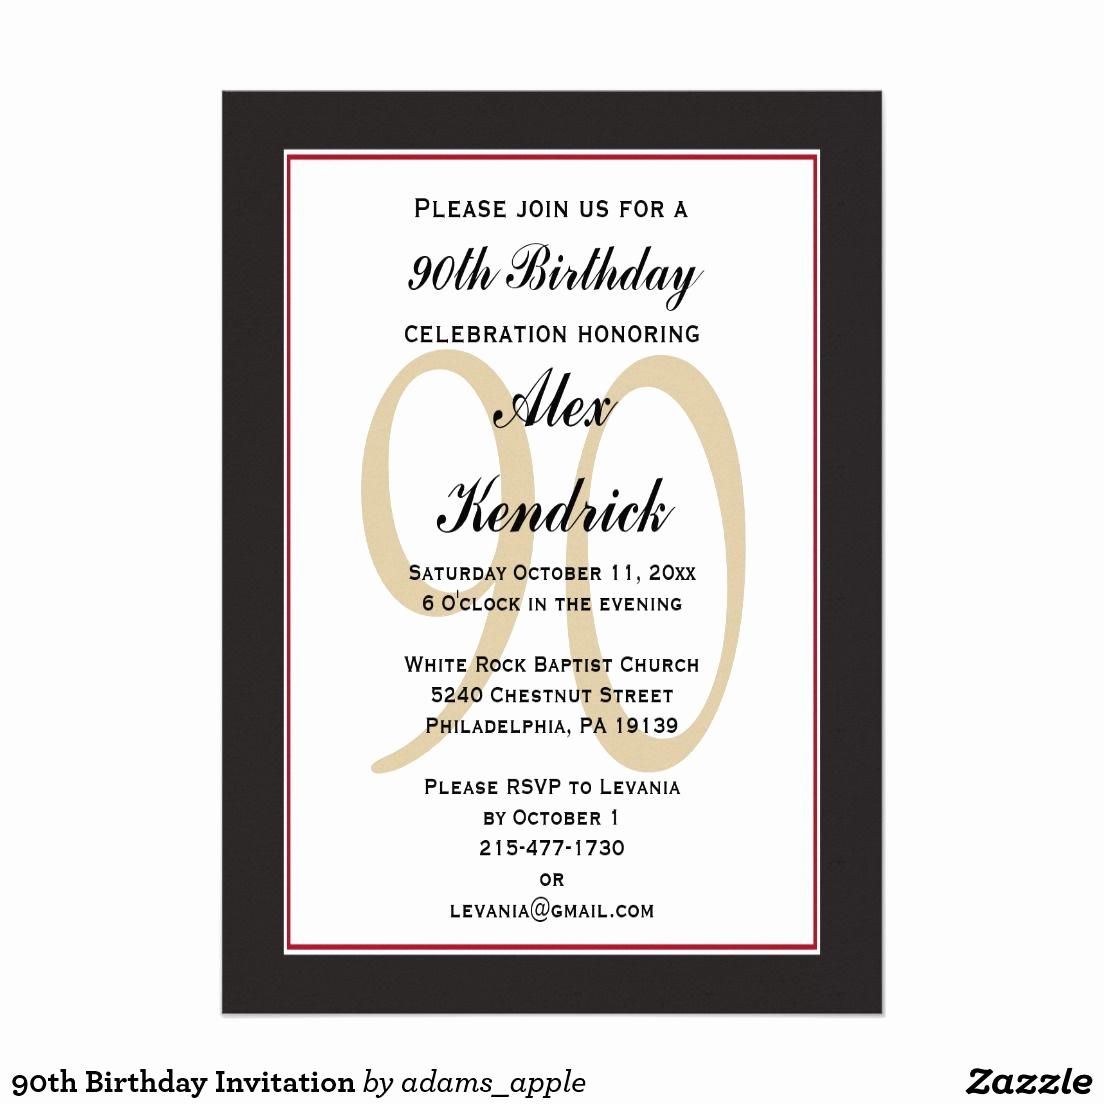 90th Birthday Invitation Ideas Luxury 90th Birthday Invitation Zazzle In 2019